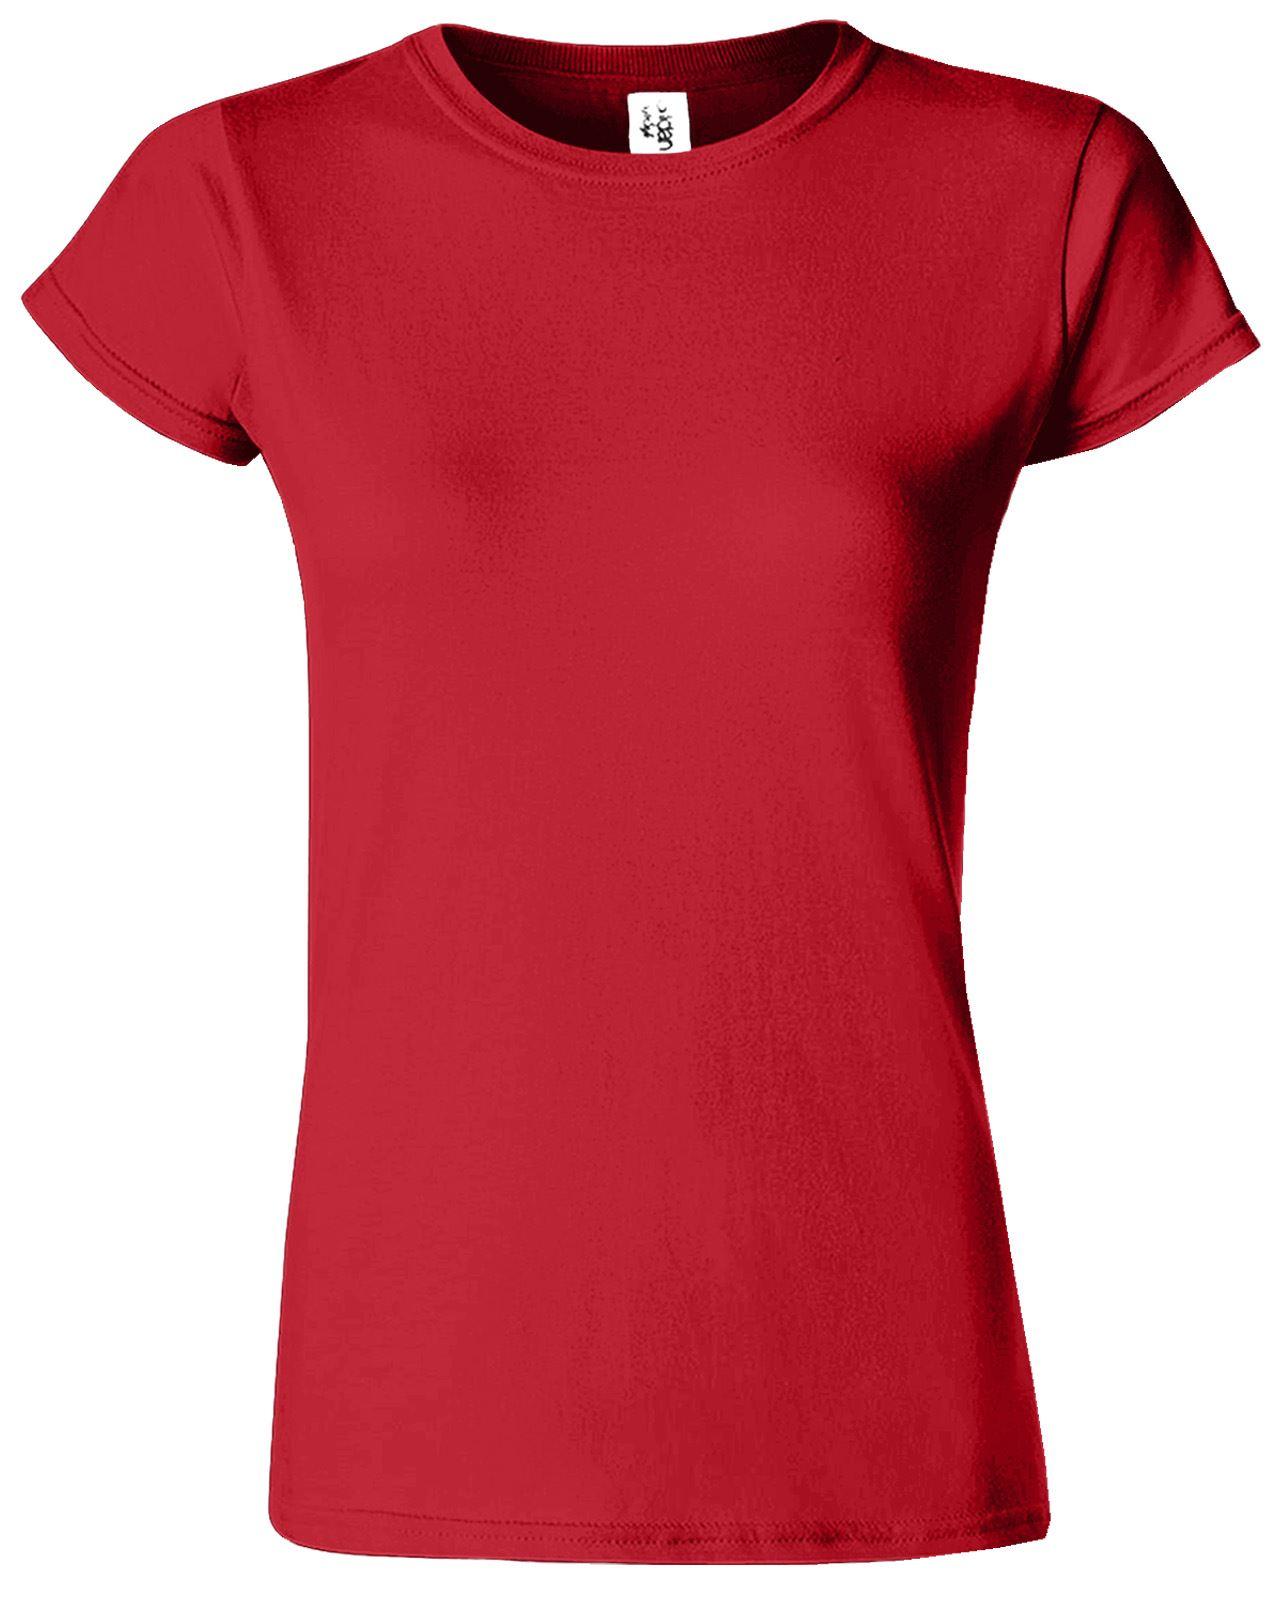 gildan blank softstyle ladies t shirt skinny fit top